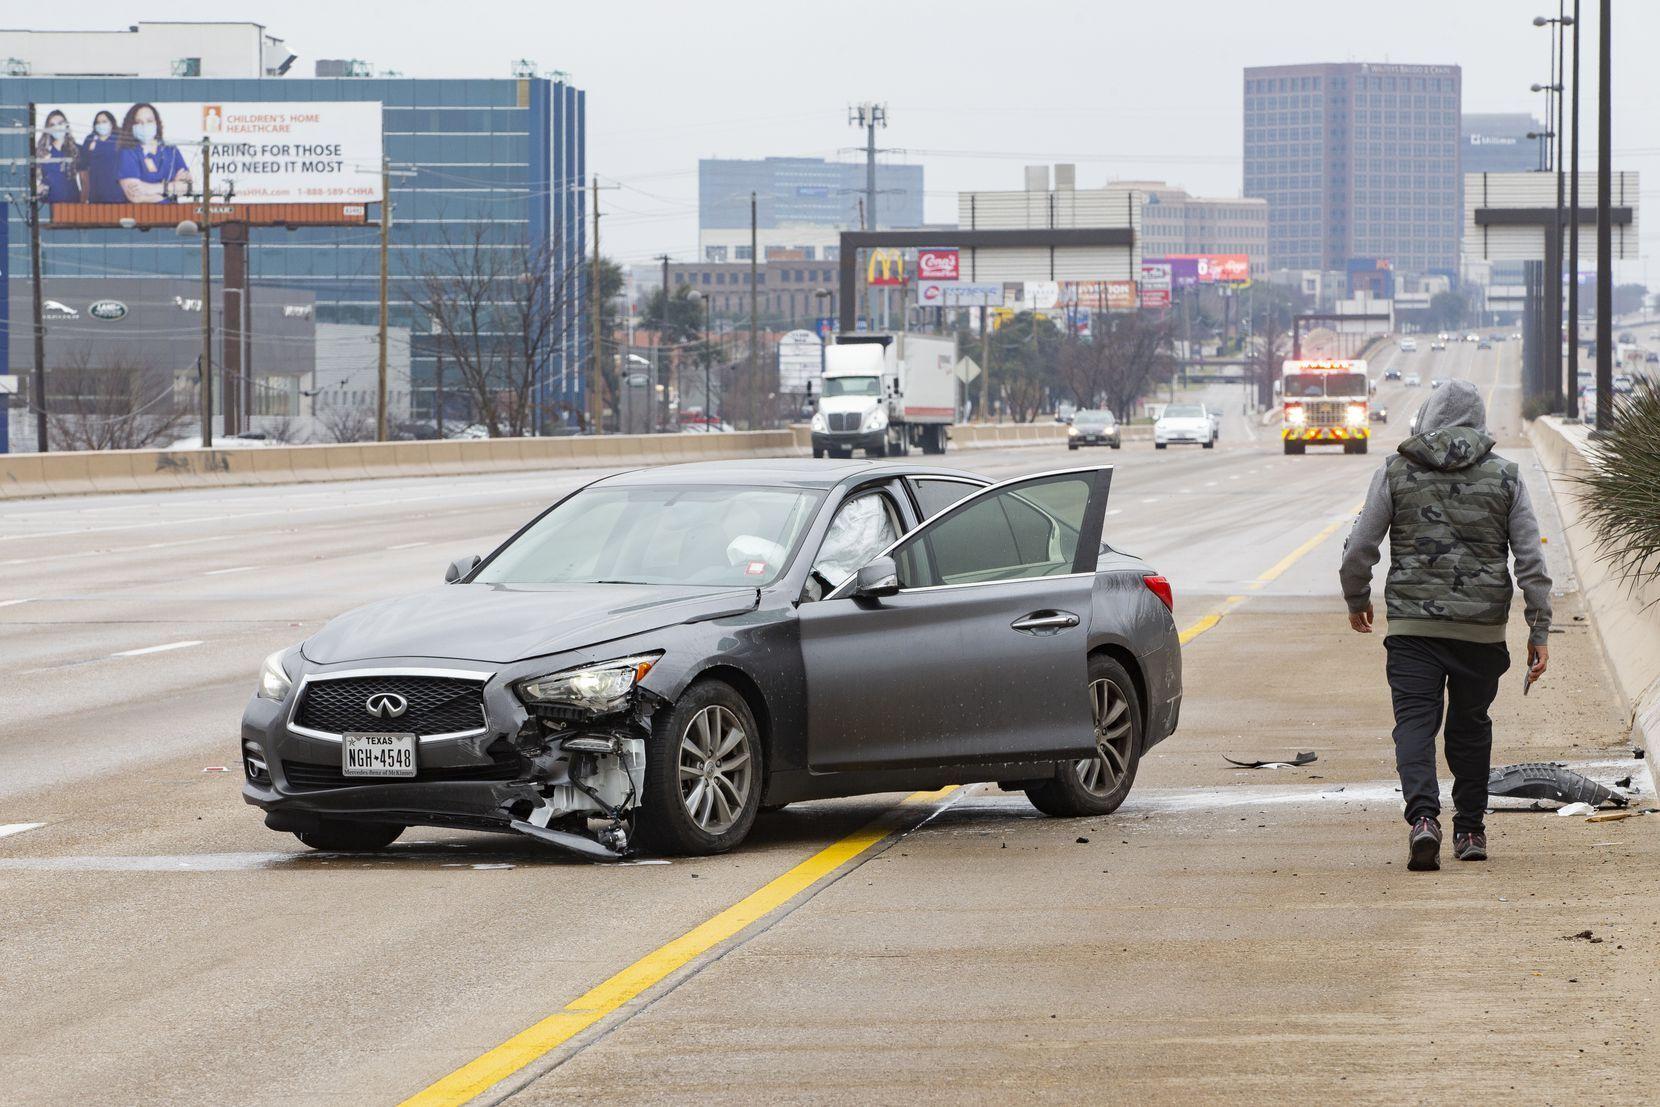 Одна из пострадавших машин